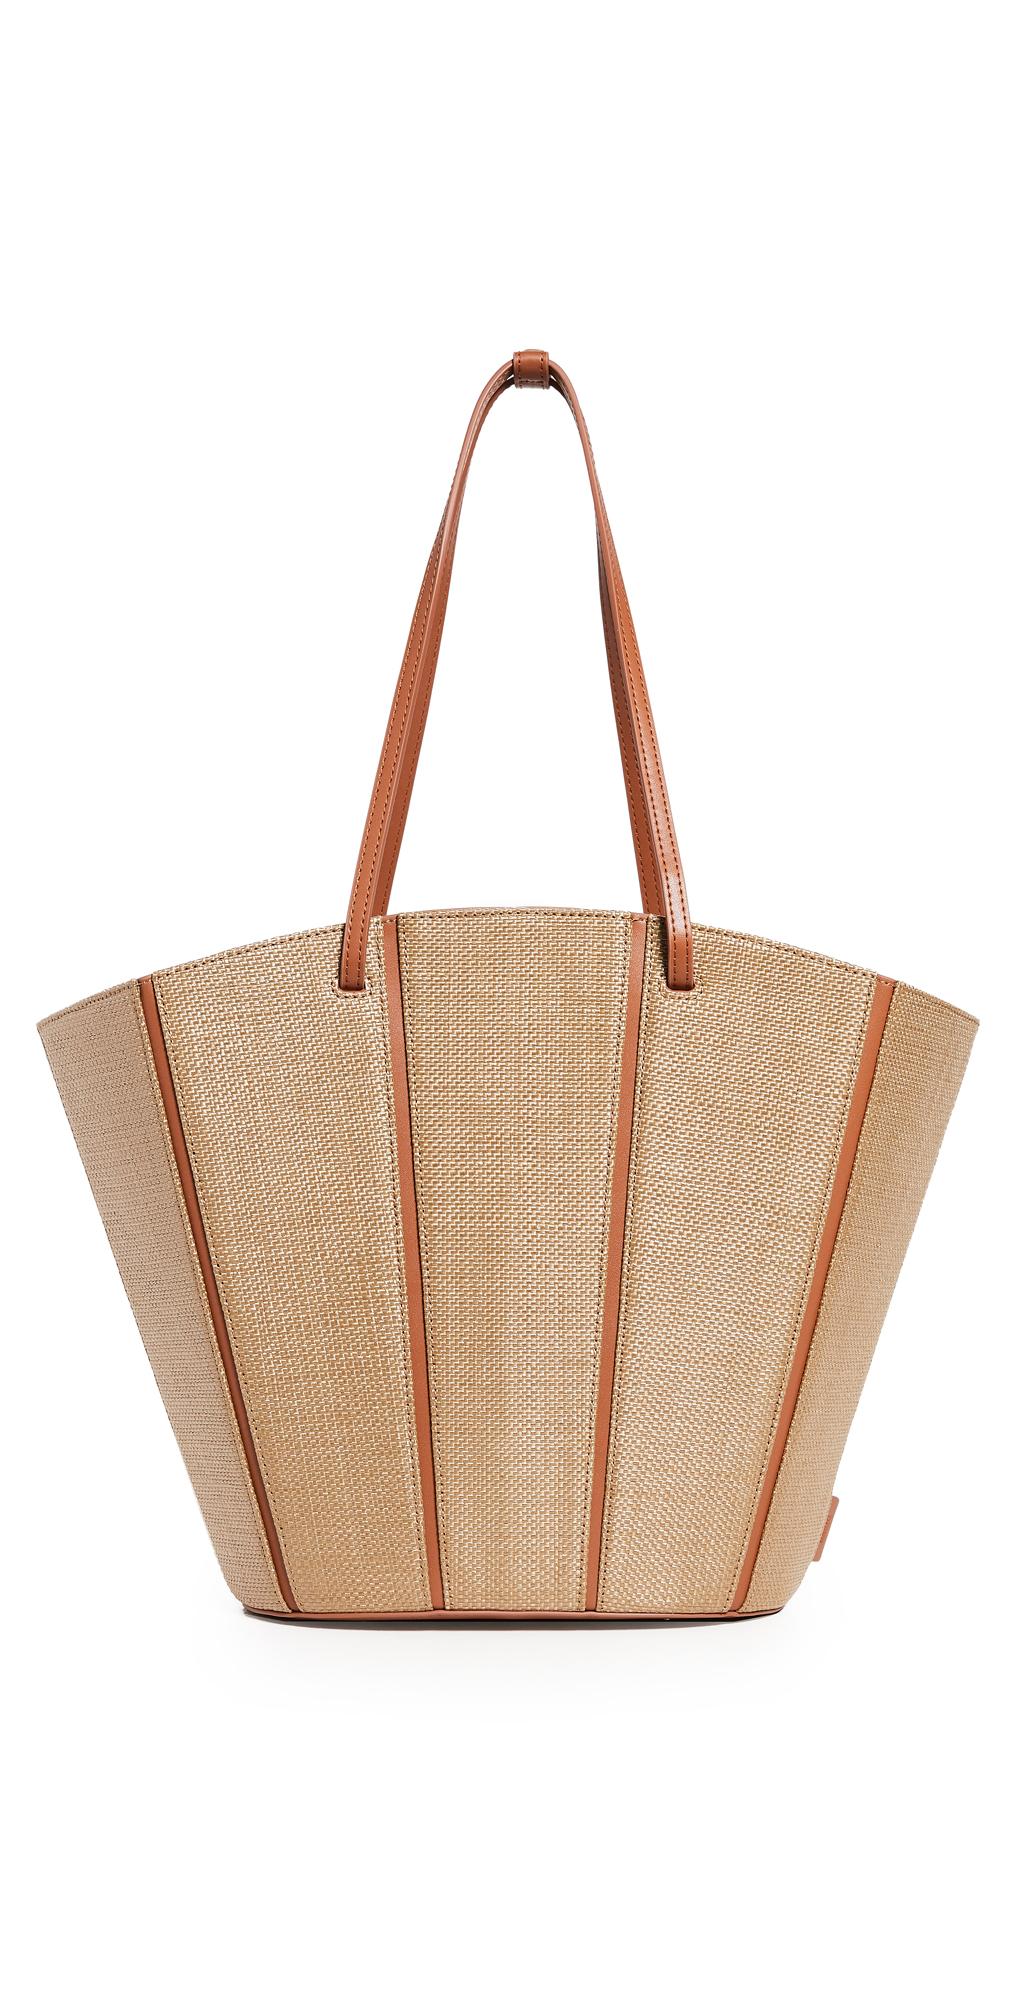 Vasic Play Marche Bag